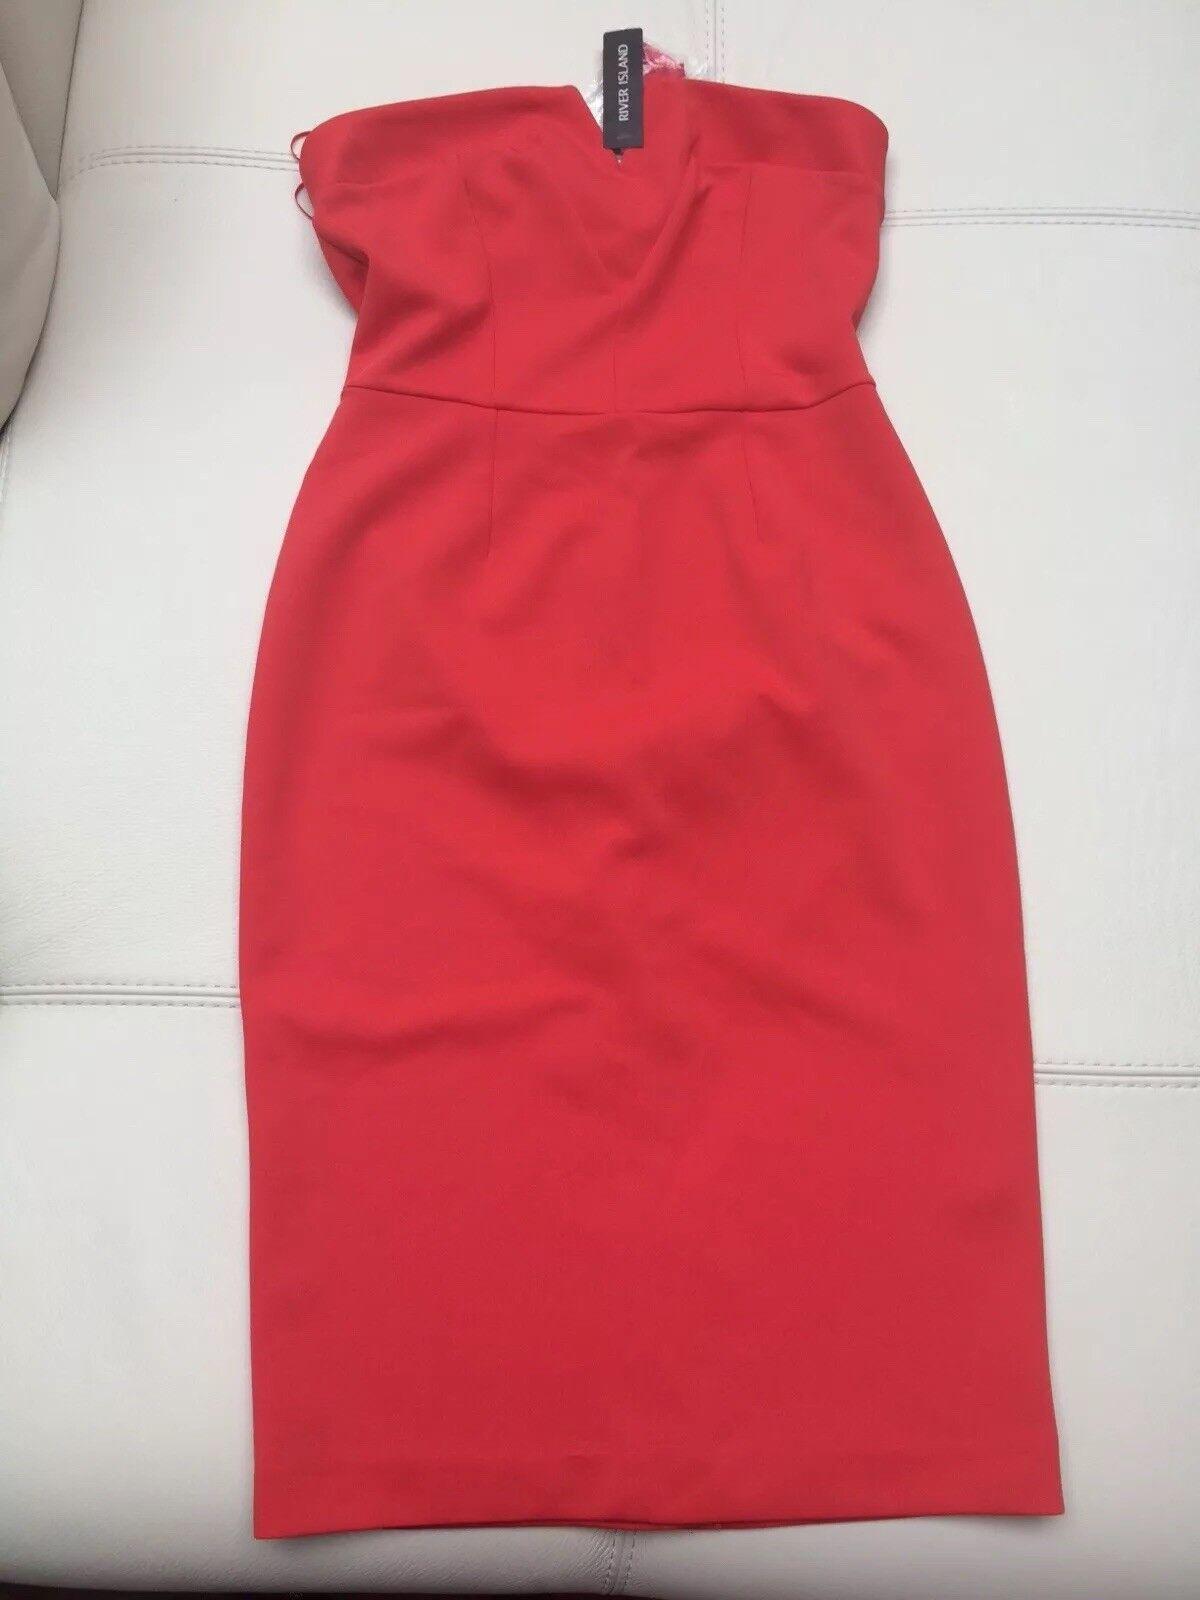 River Island Dress Sz 10 Uk